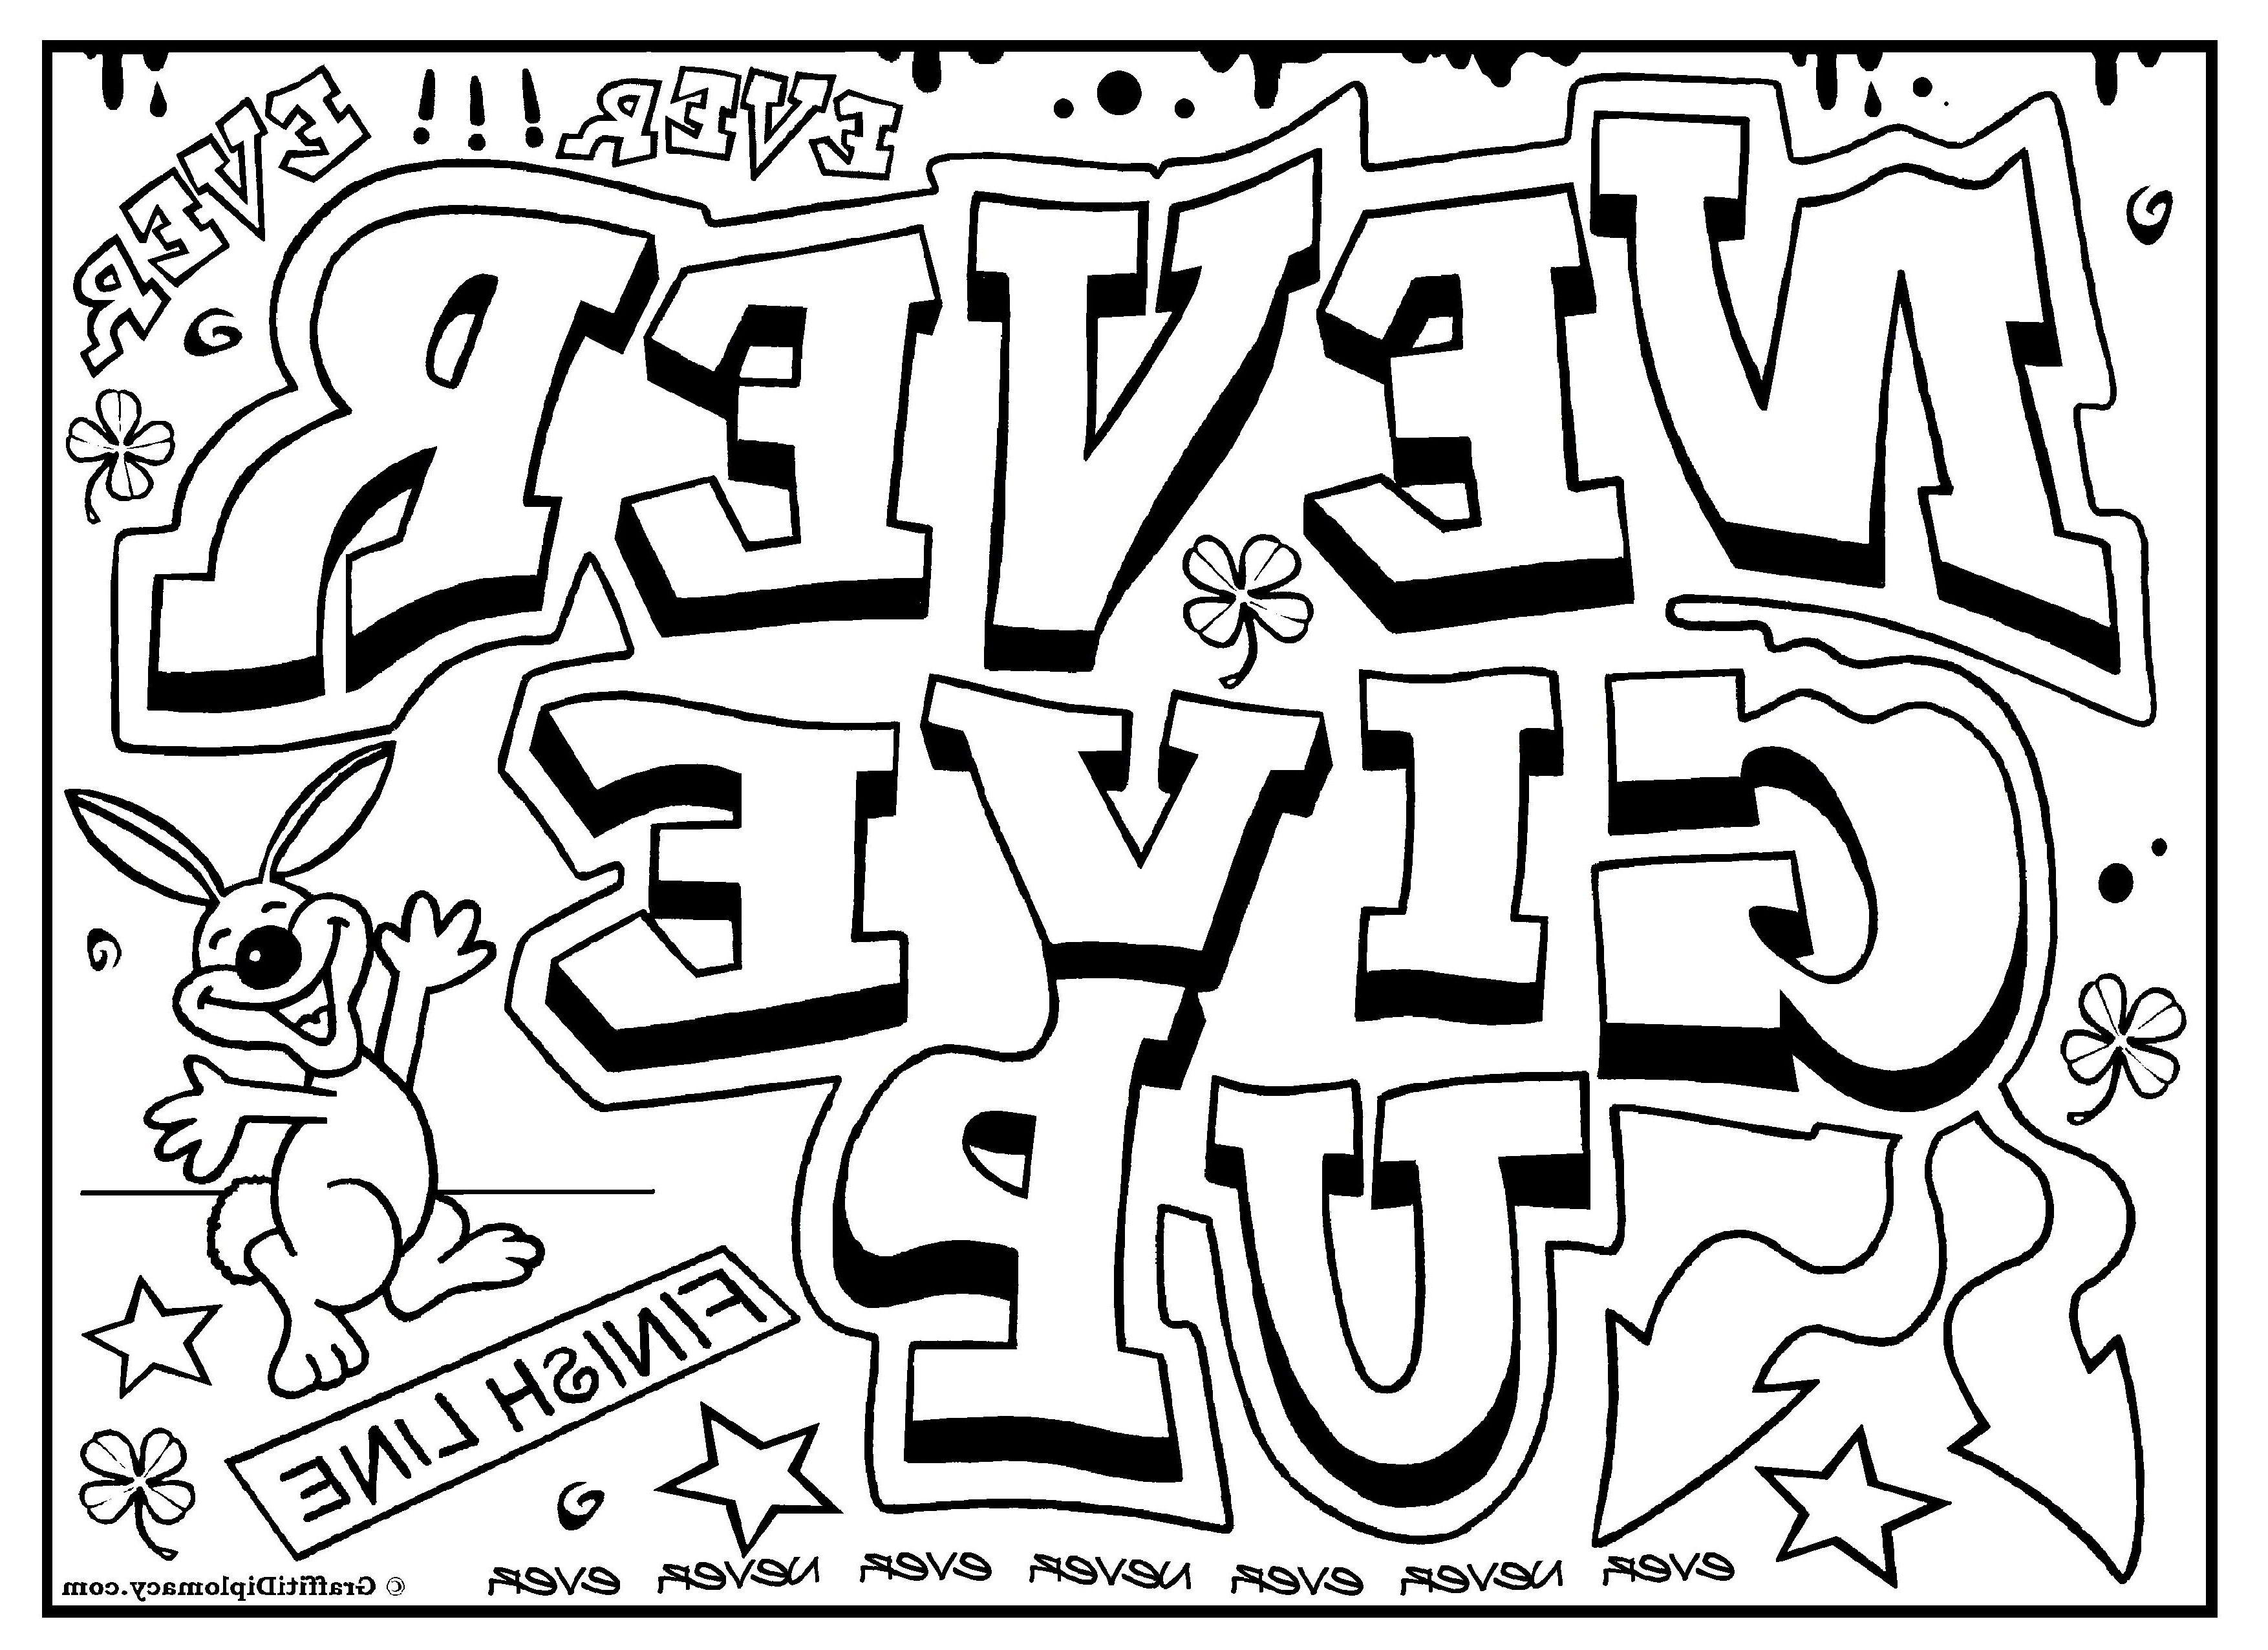 Graffiti Coloring Pages Vfbi Graffiti Coloring Page Free